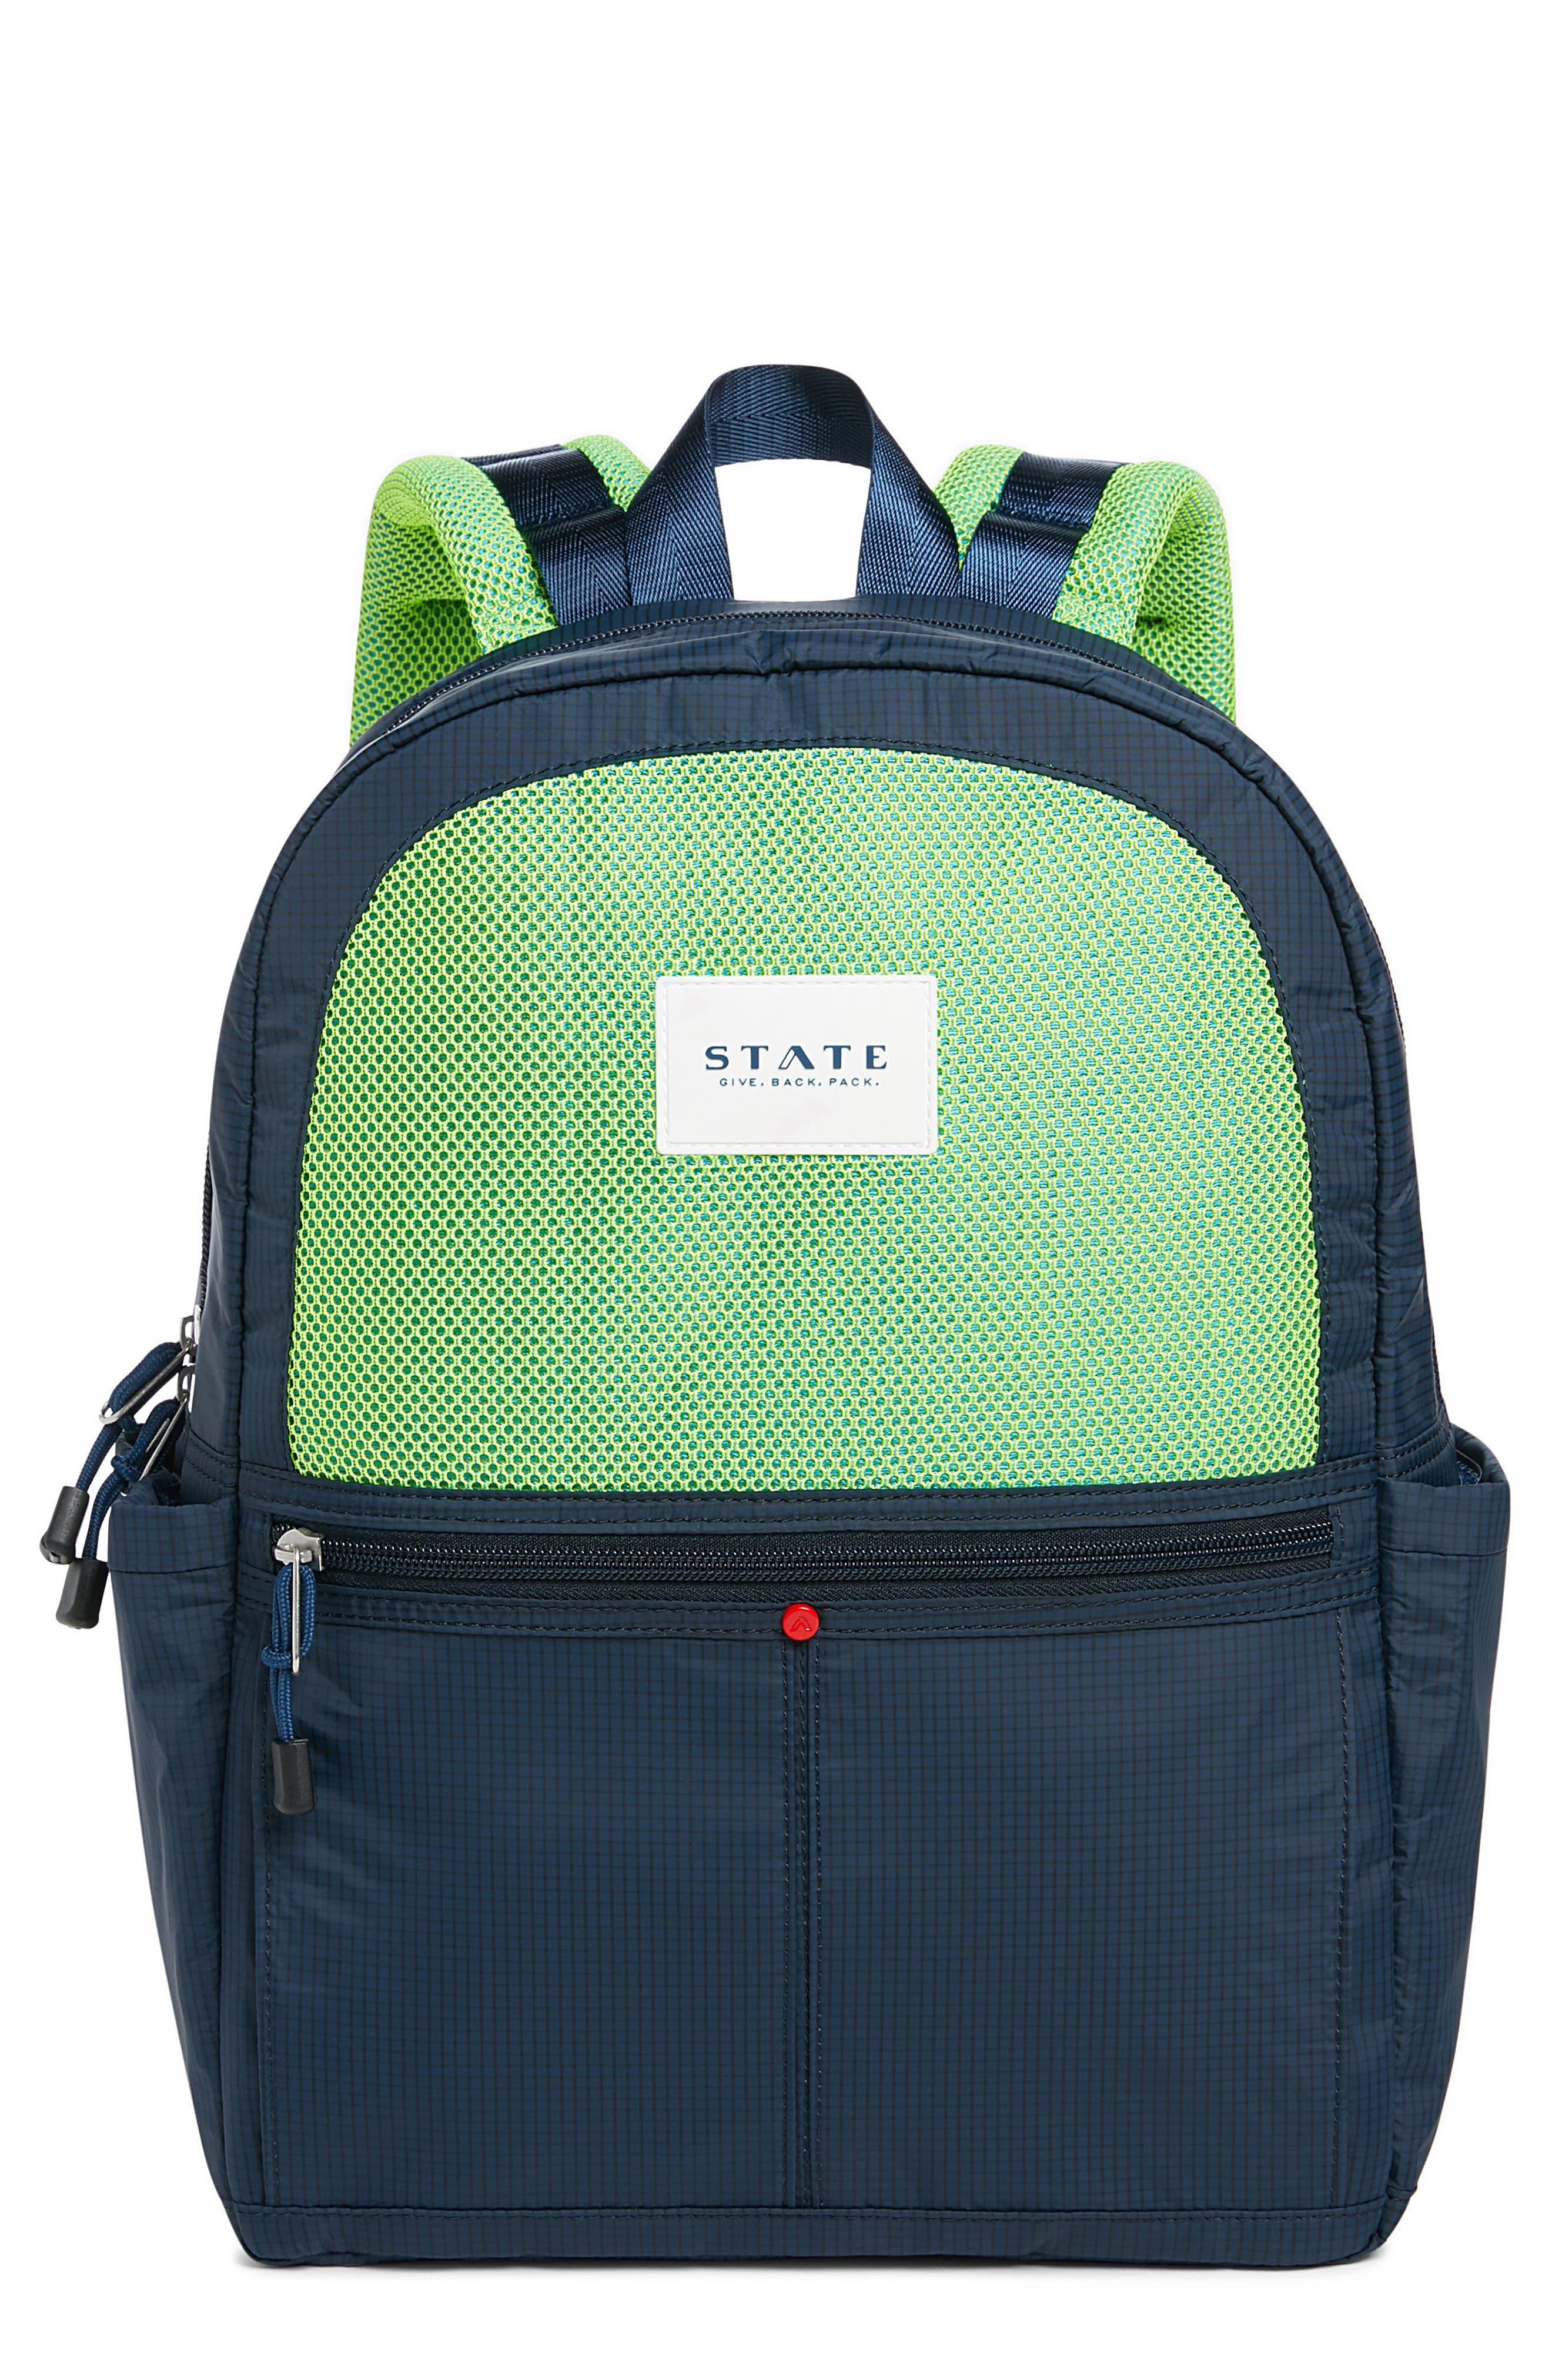 Georgetown Kane Backpack,                         Main,                         color, Navy